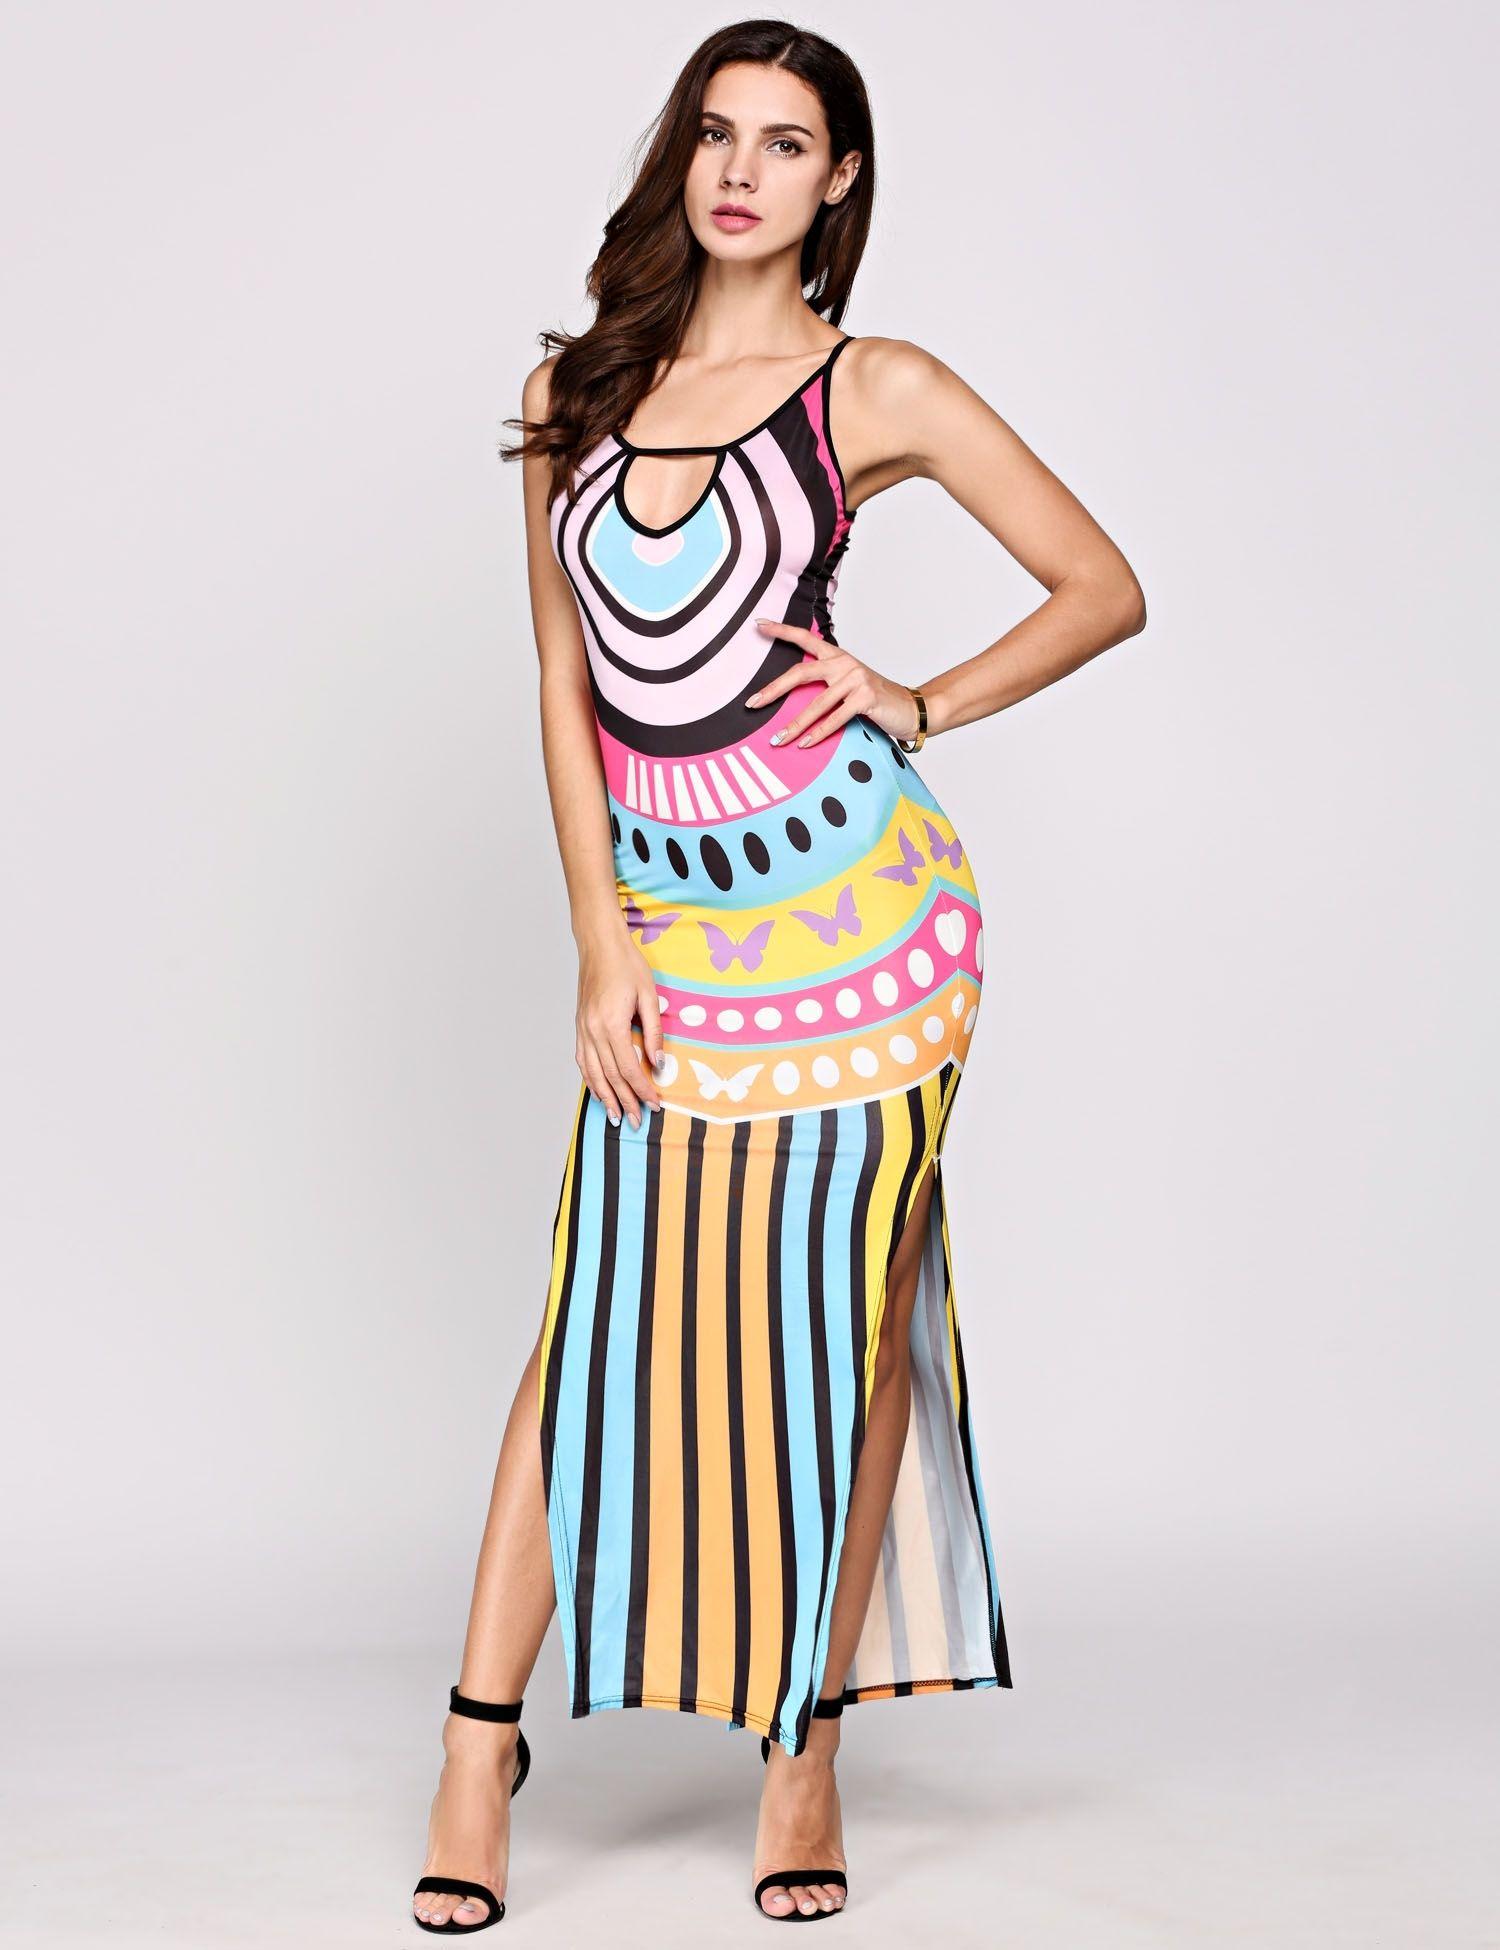 Yellow dress for women  Yellow Sleeveless Cut Halter Dress  ropa q yo me pondria para